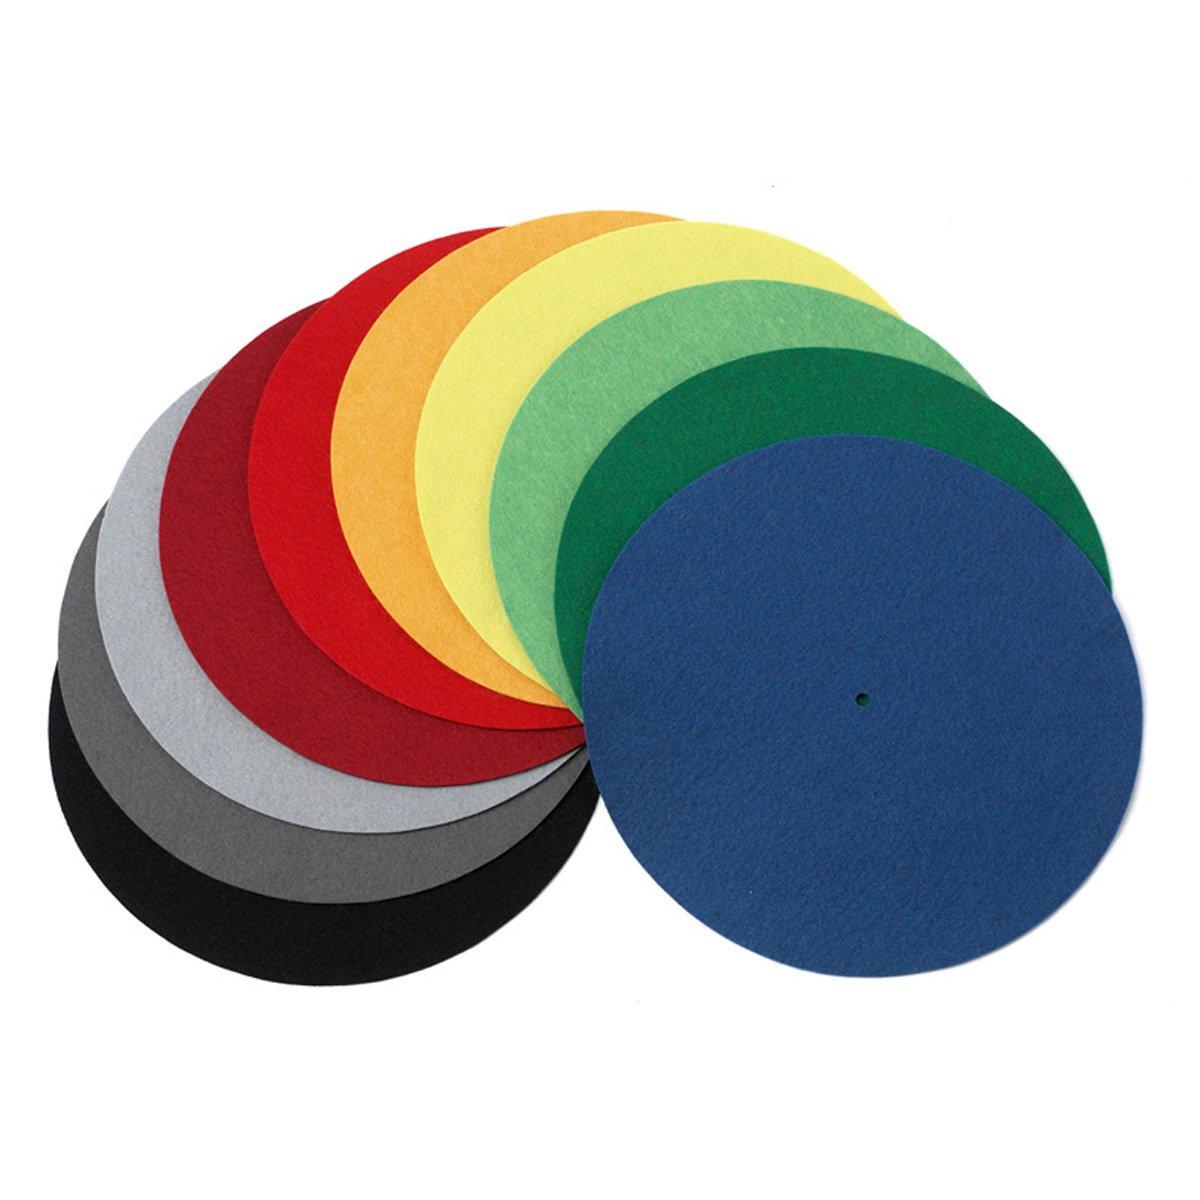 Pro-Ject Felt Turntable Mat in Designer Colors (Orange)